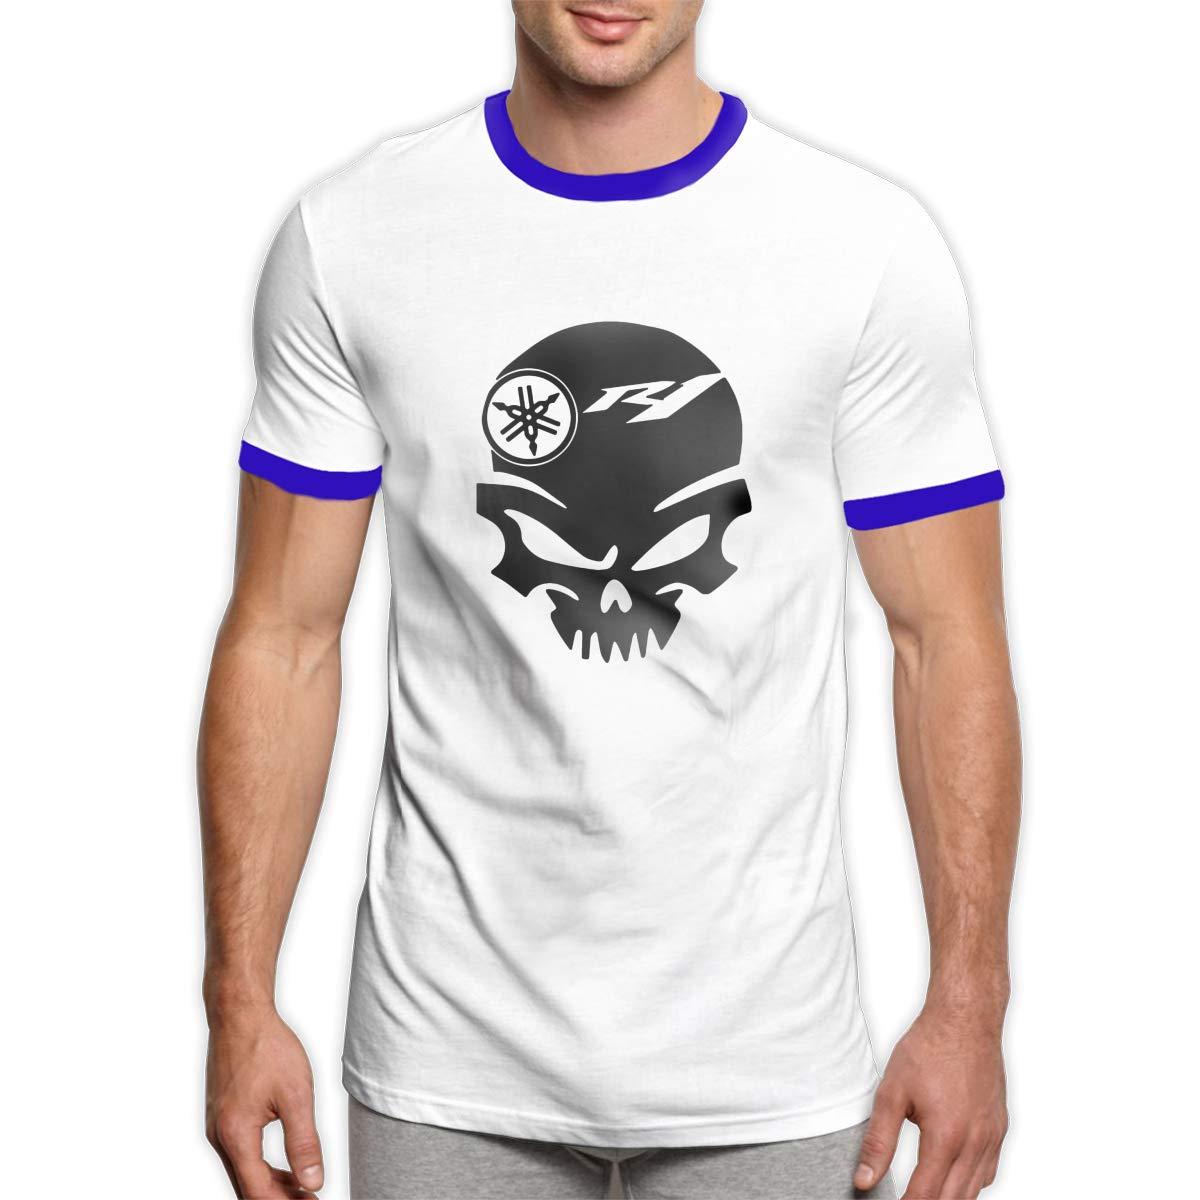 TIANXIN Customized Yamaha Motorsports R1 Skull Logo T Shirt Short Sleeve 100/% Cotton for Mens Black